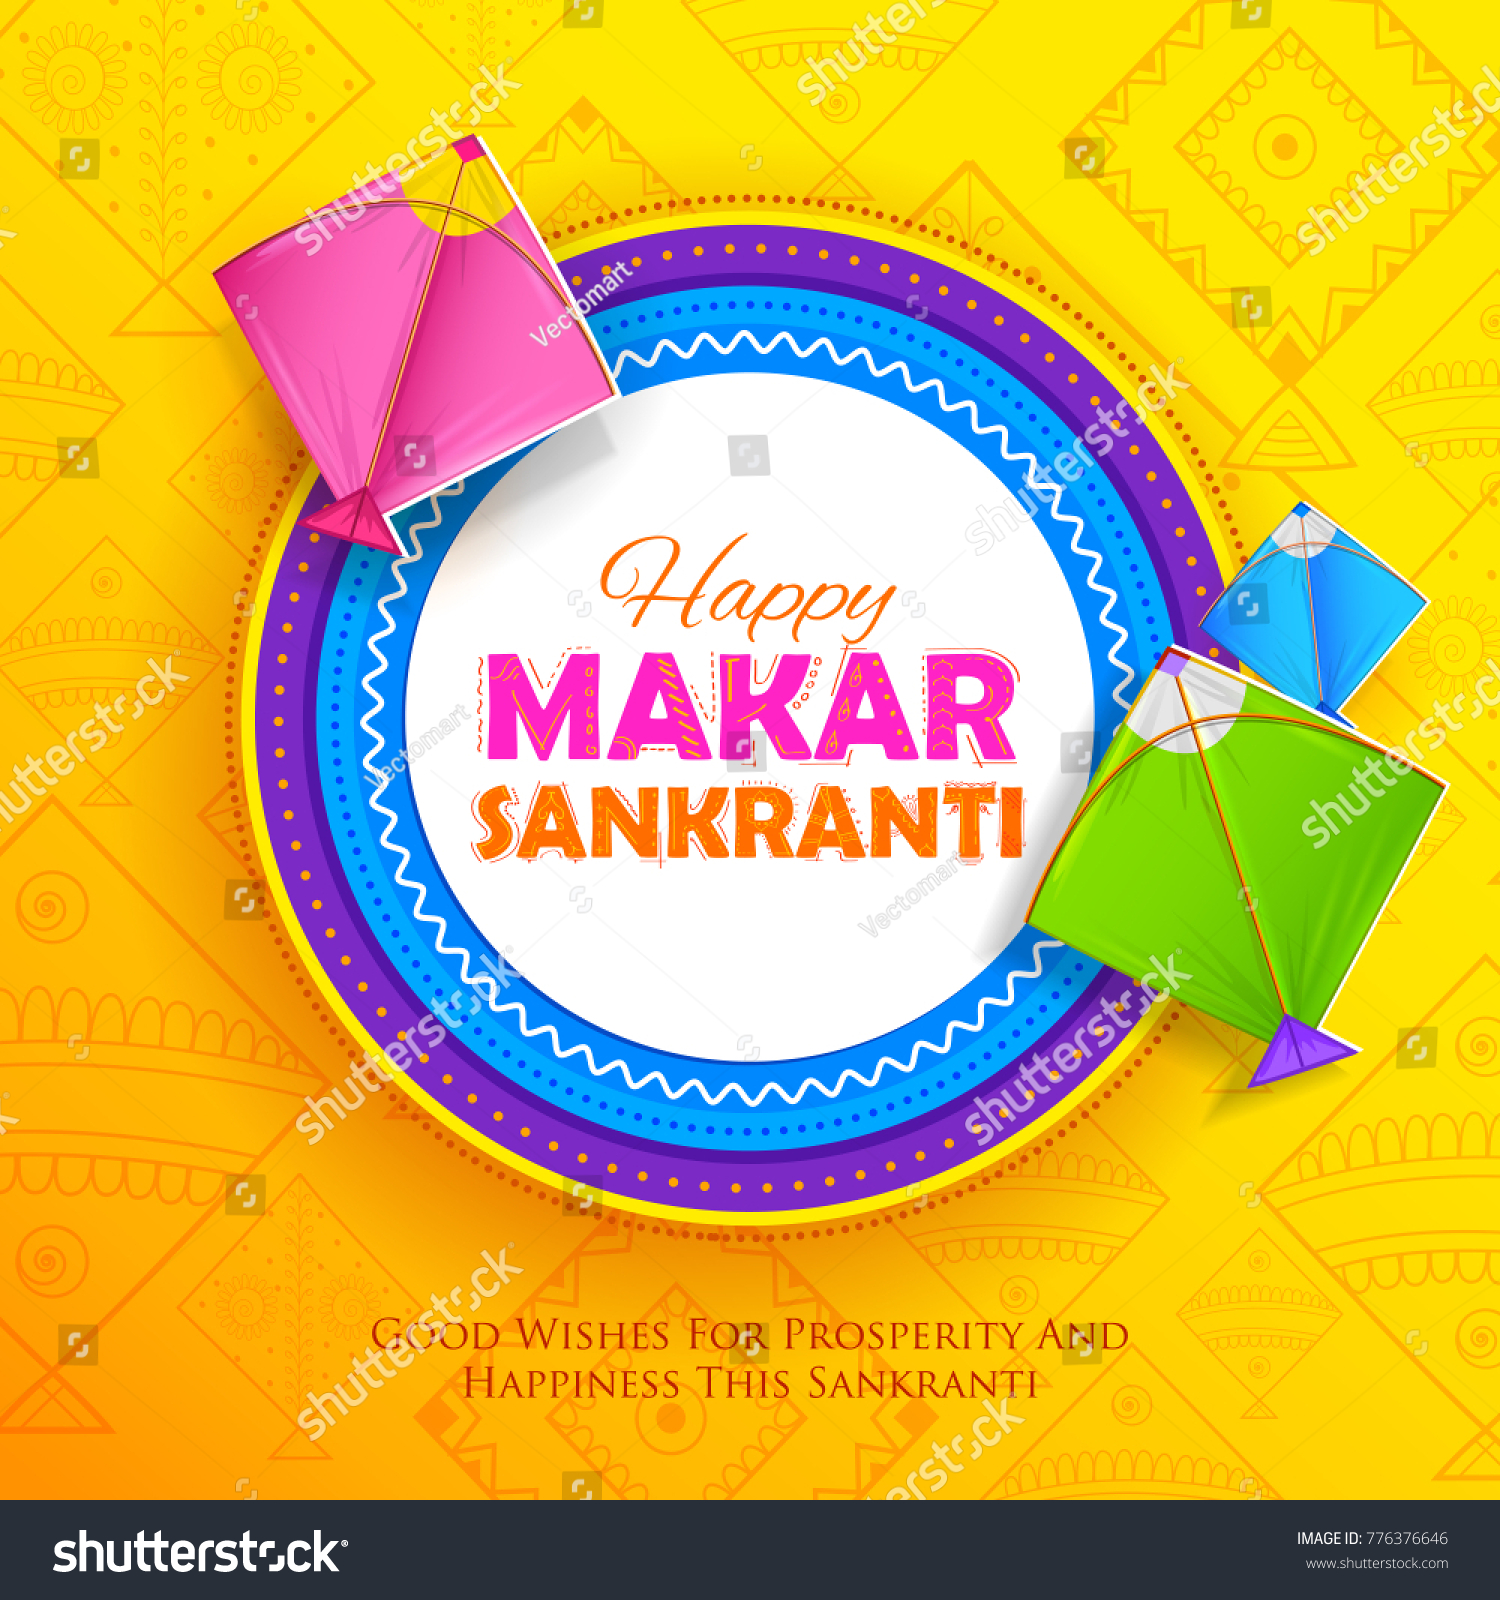 Illustration Happy Makar Sankranti Wallpaper Colorful Stock Vector